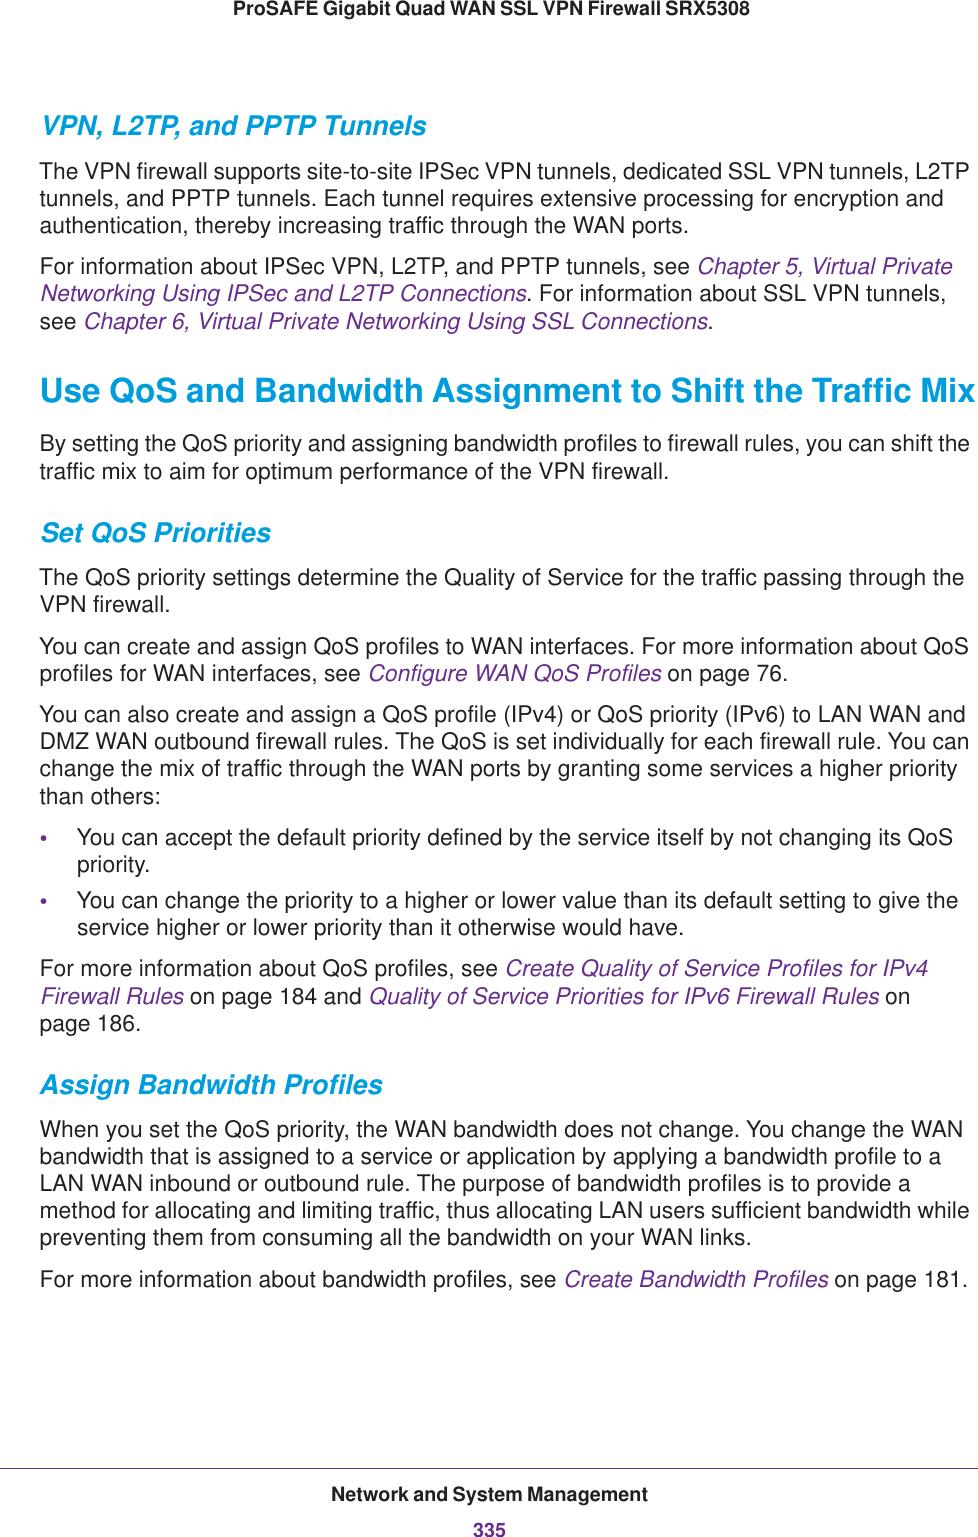 Netgear Srx5308 Quick Reference Guide ProSAFE Gigabit Quad